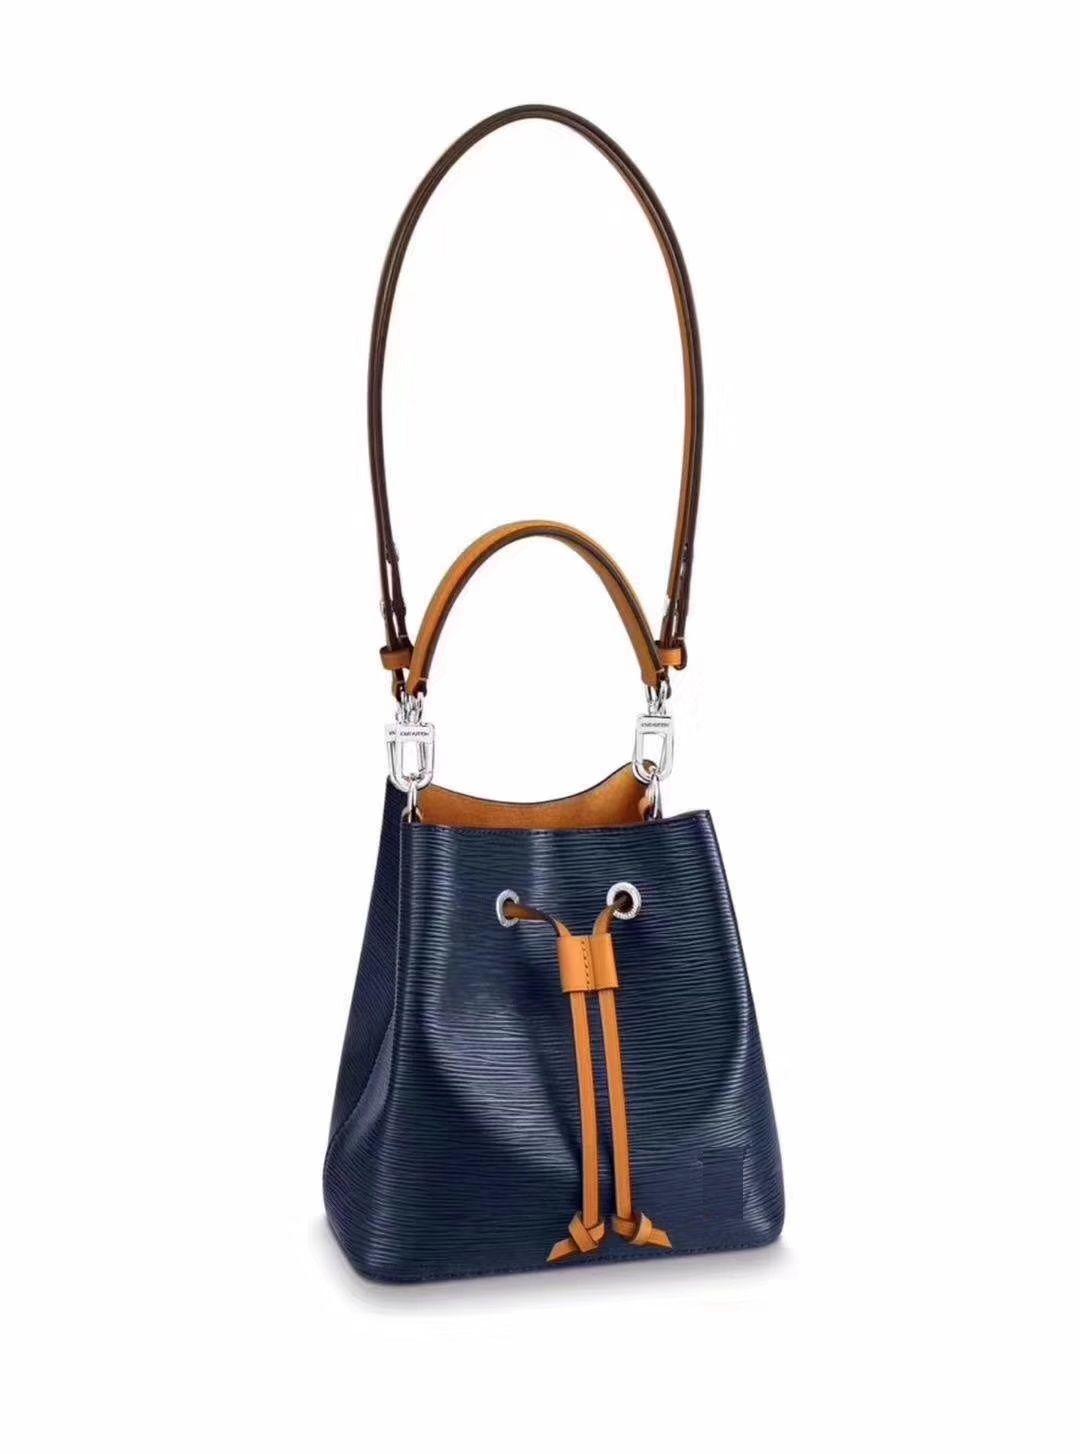 1b7cc73f44a1 Womens famous brands designer Fashion handbags crossbody purse TWIST NEONOE  shoulder bags Noé leather bucket bag cheap Evening Totes